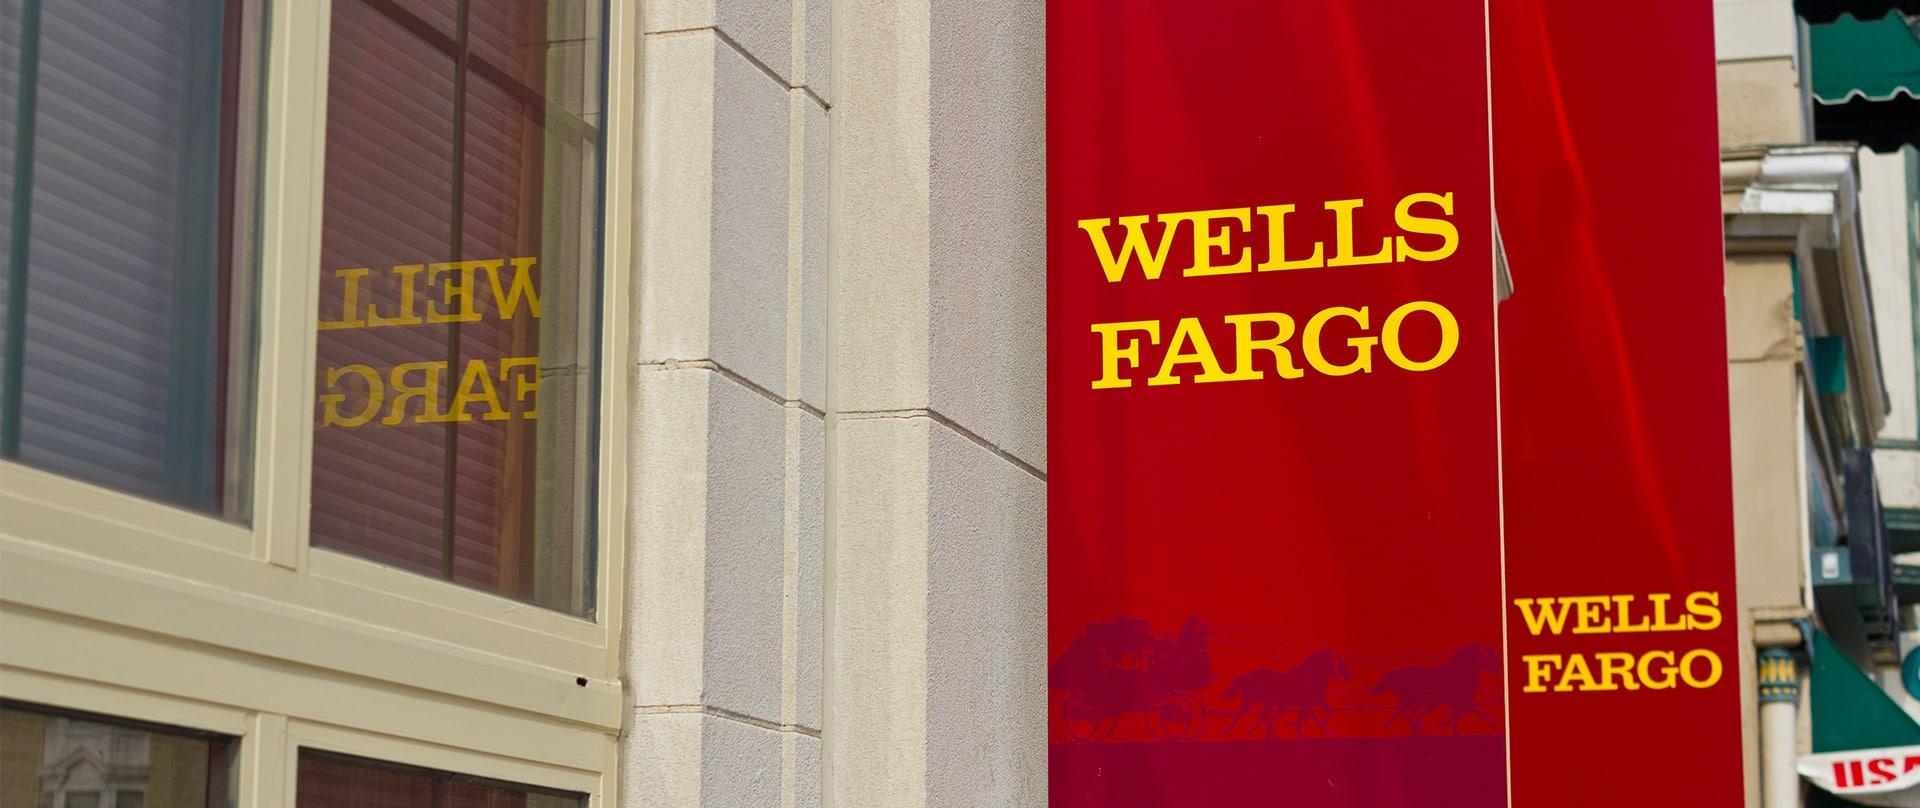 wf-fraud-scandal-blog-header